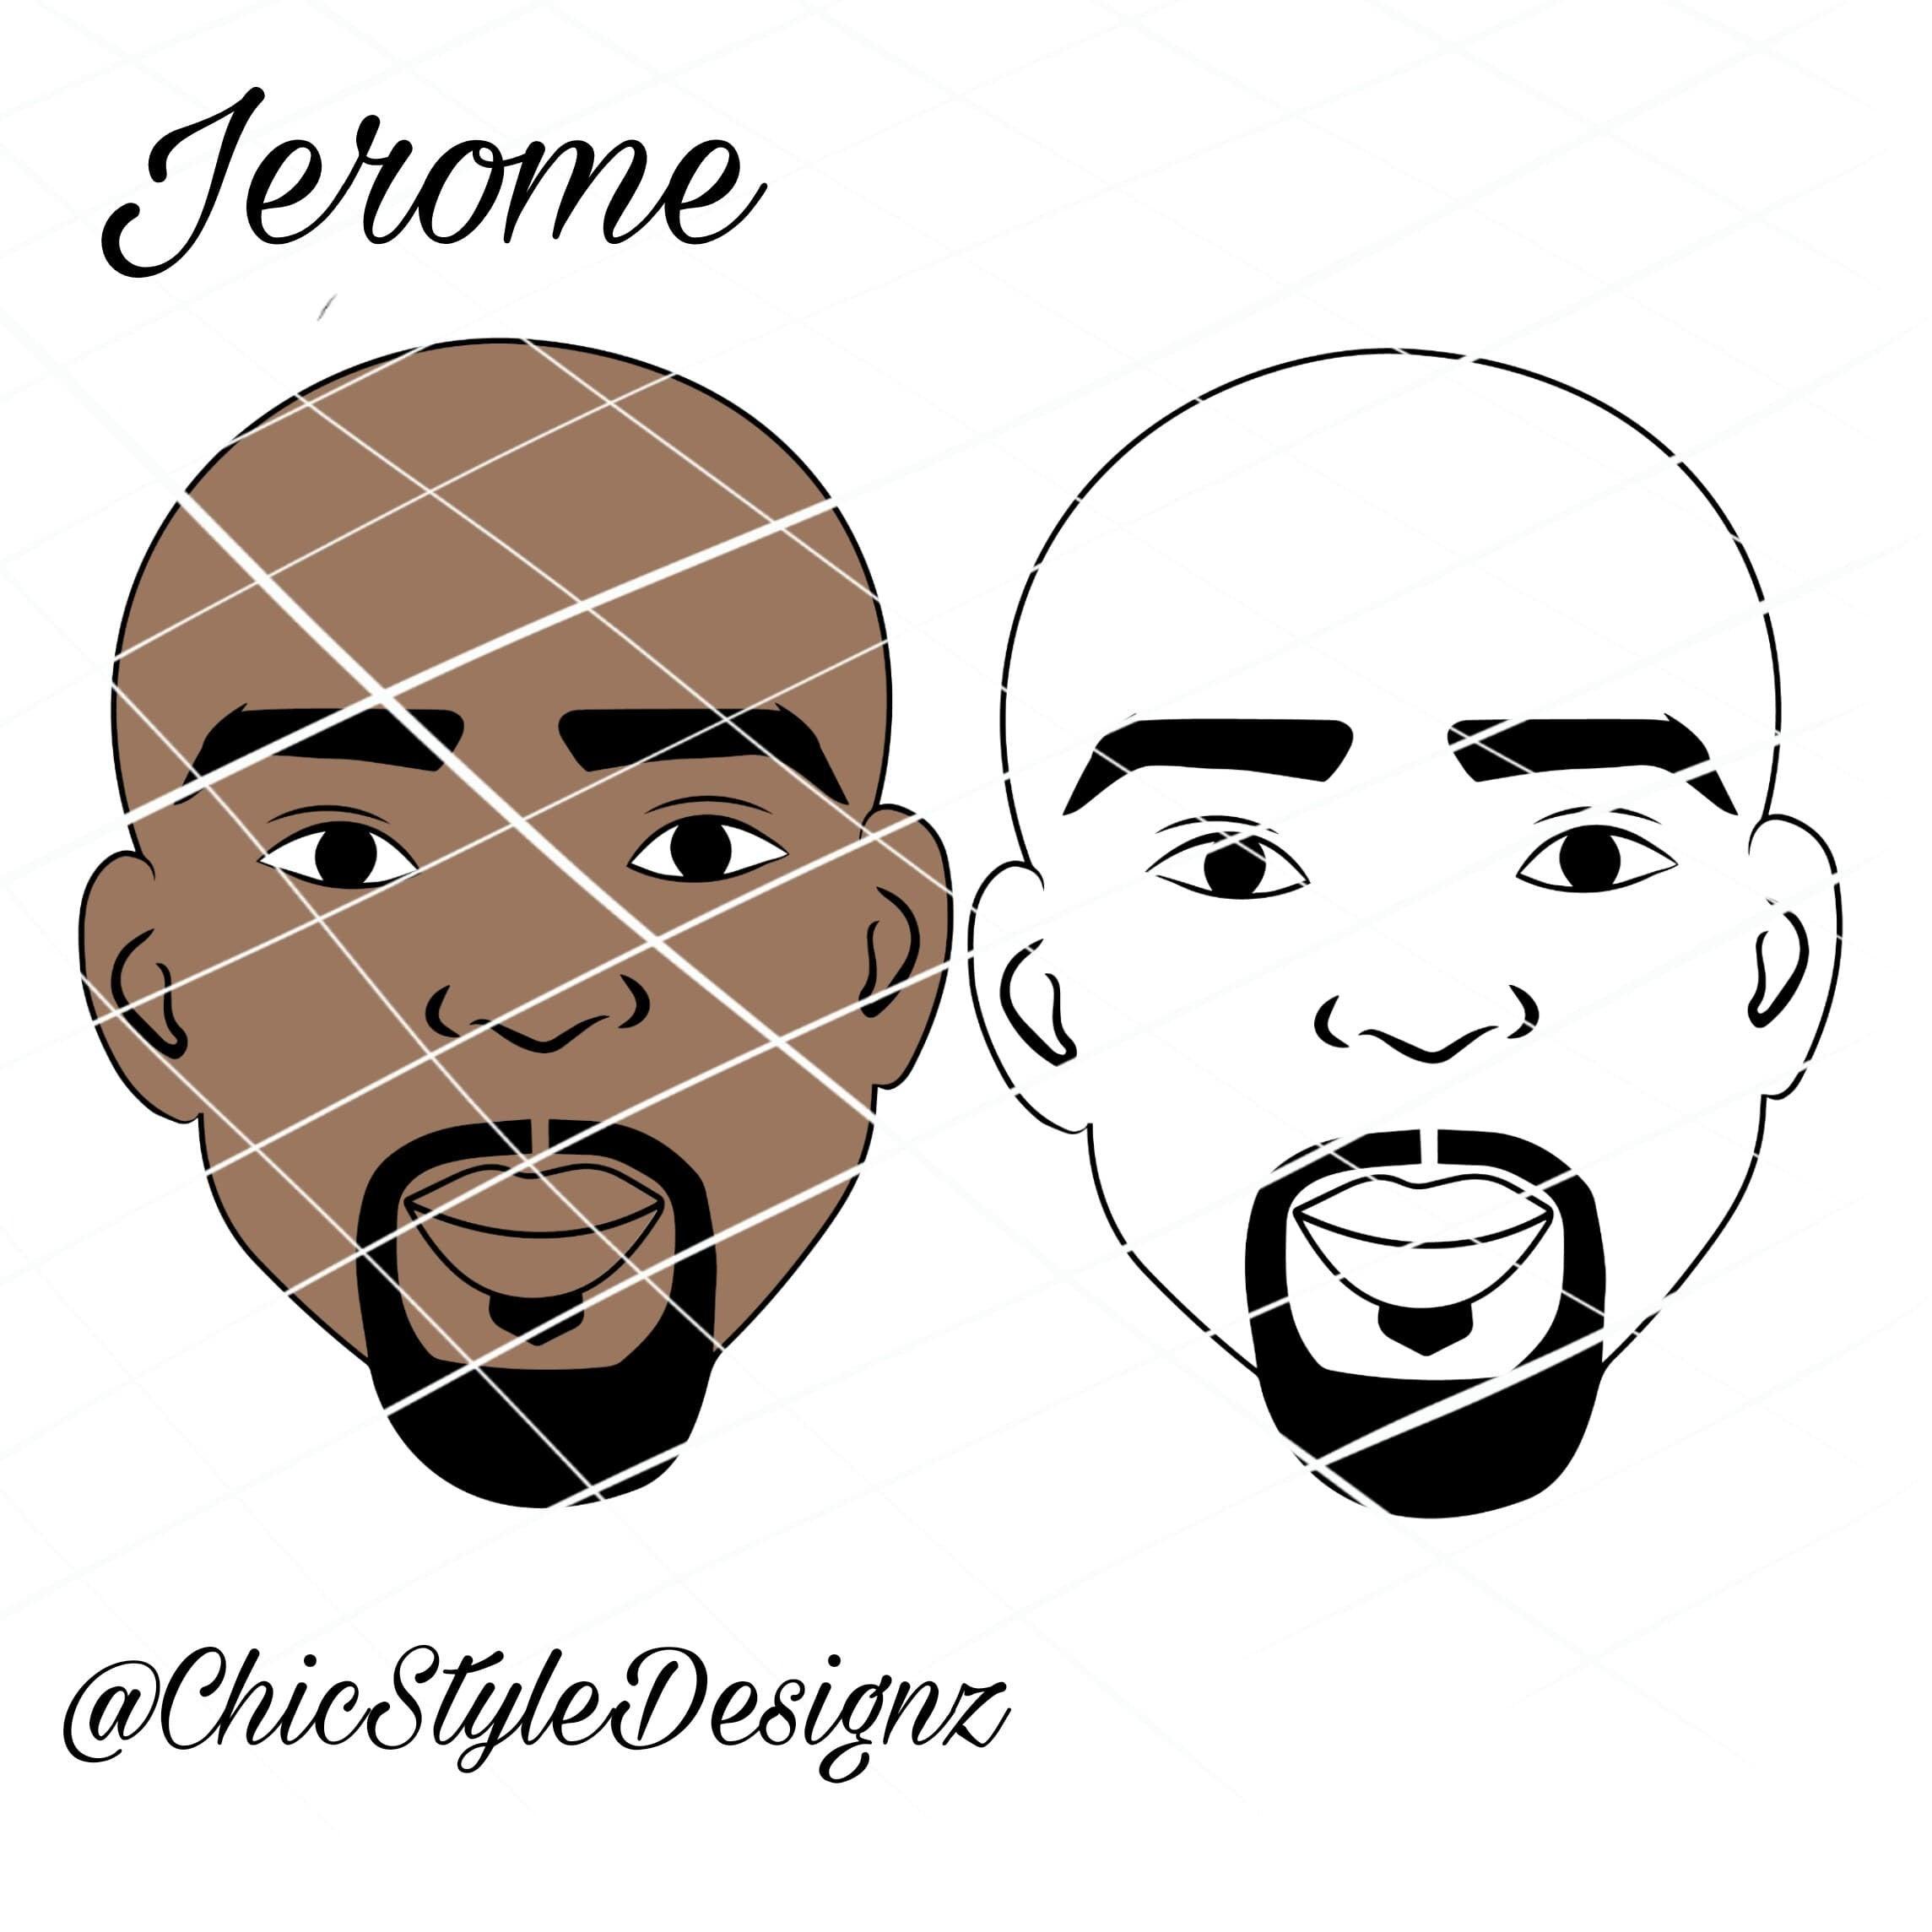 2289x2289 jerome black man black male man man with etsy